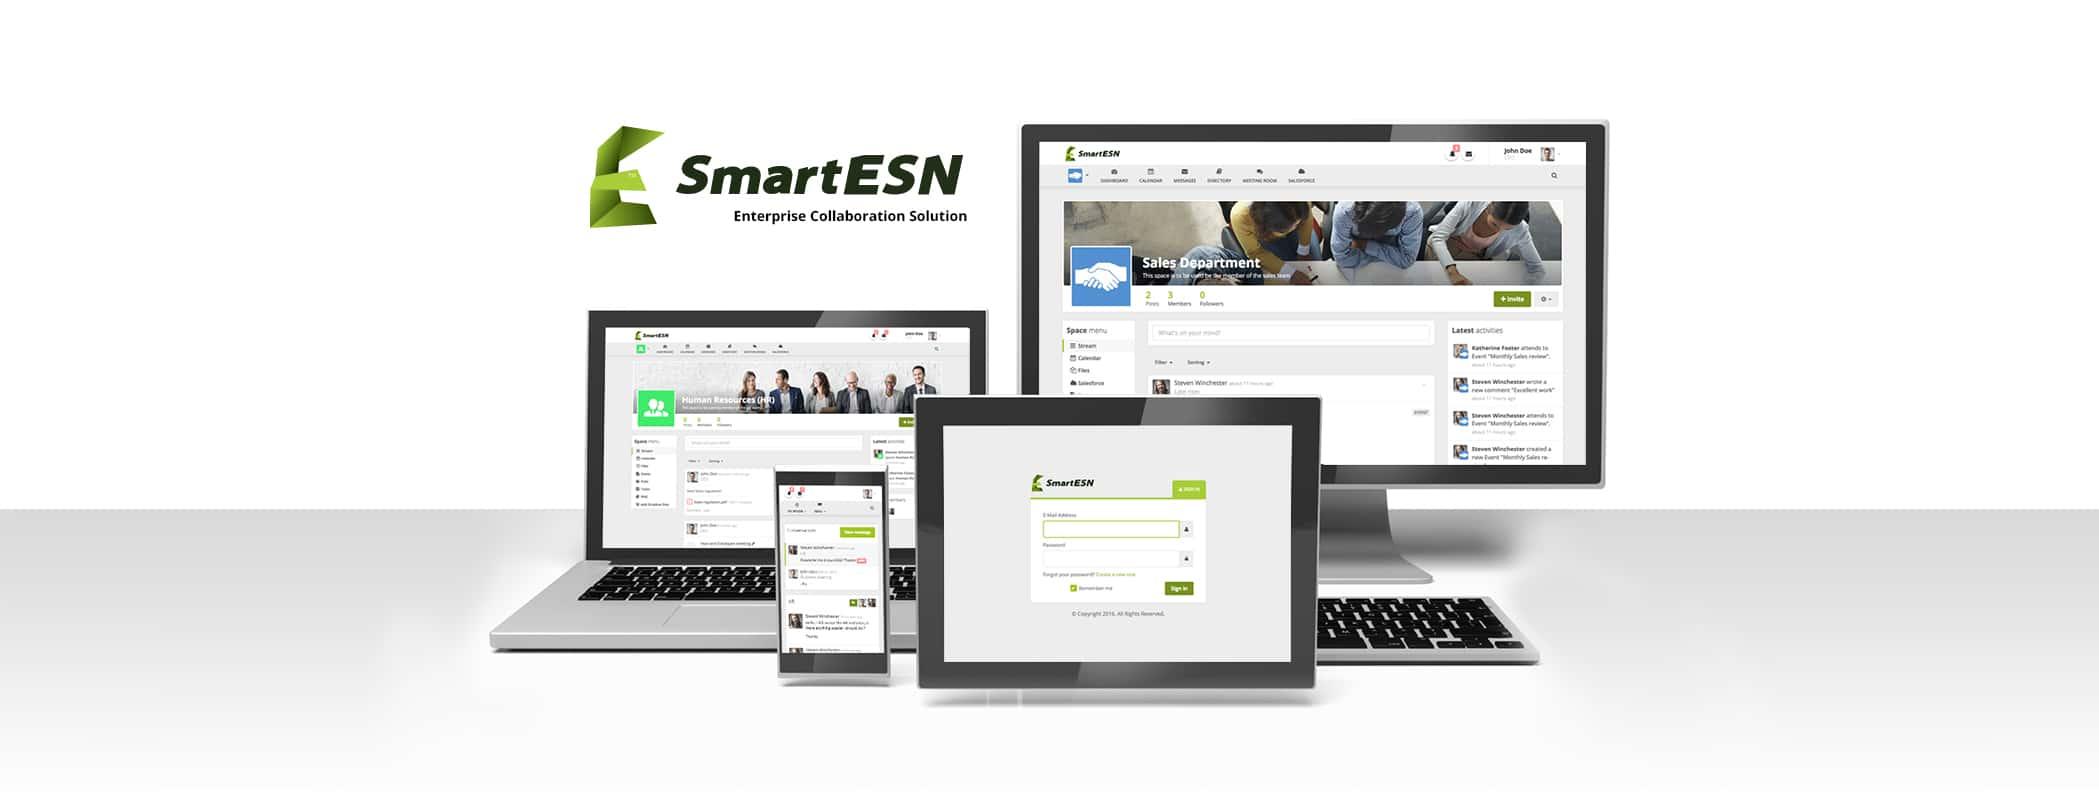 SmartESN Banner